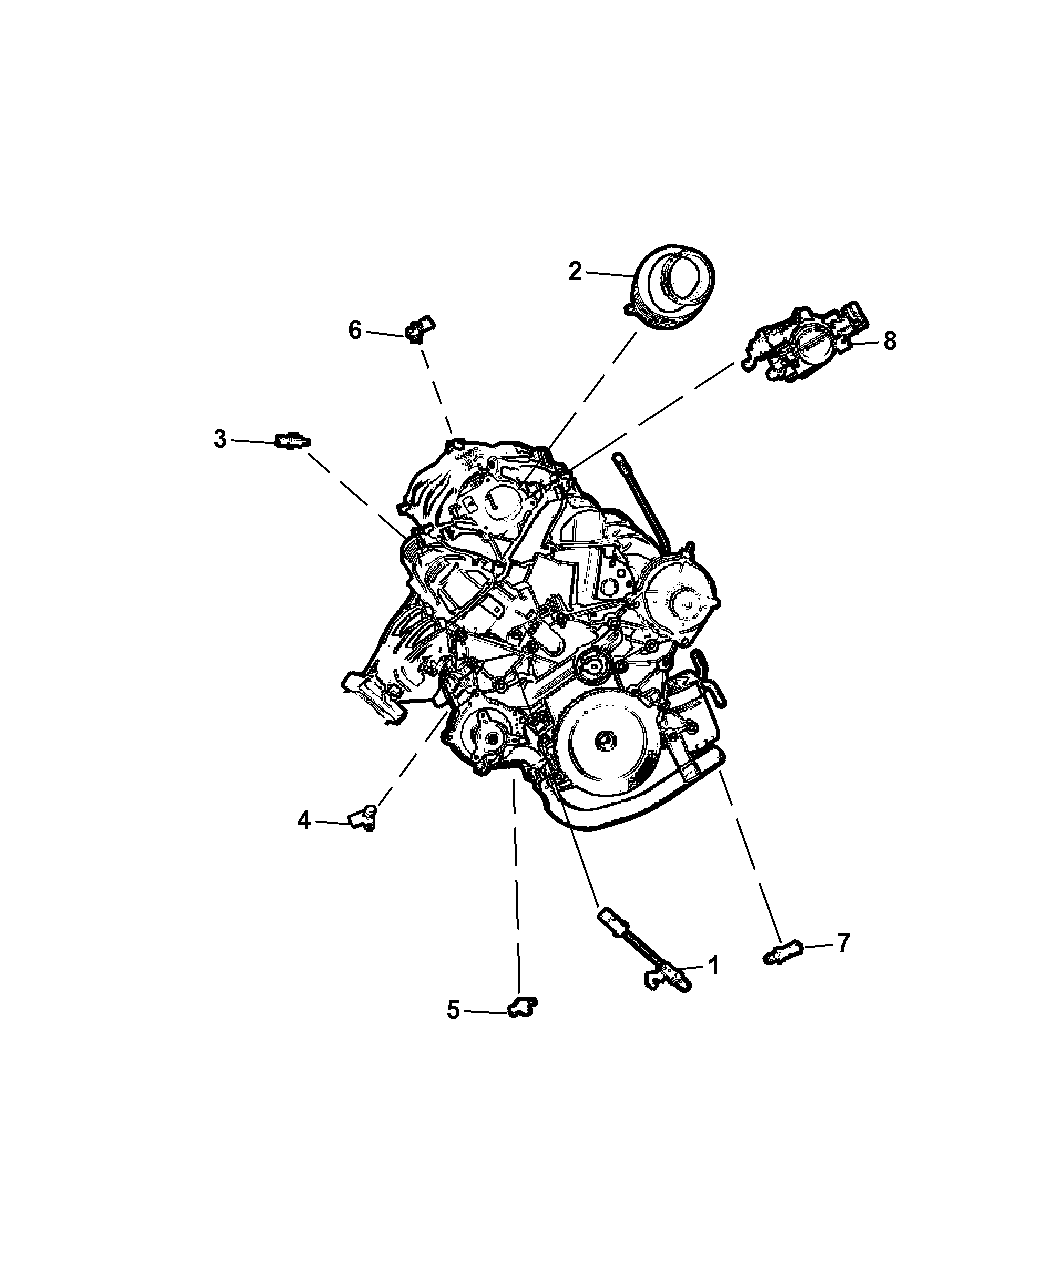 jeep engine diagram cam 5149176aa - genuine jeep sensor-charge air temp 2014 jeep engine diagram #9